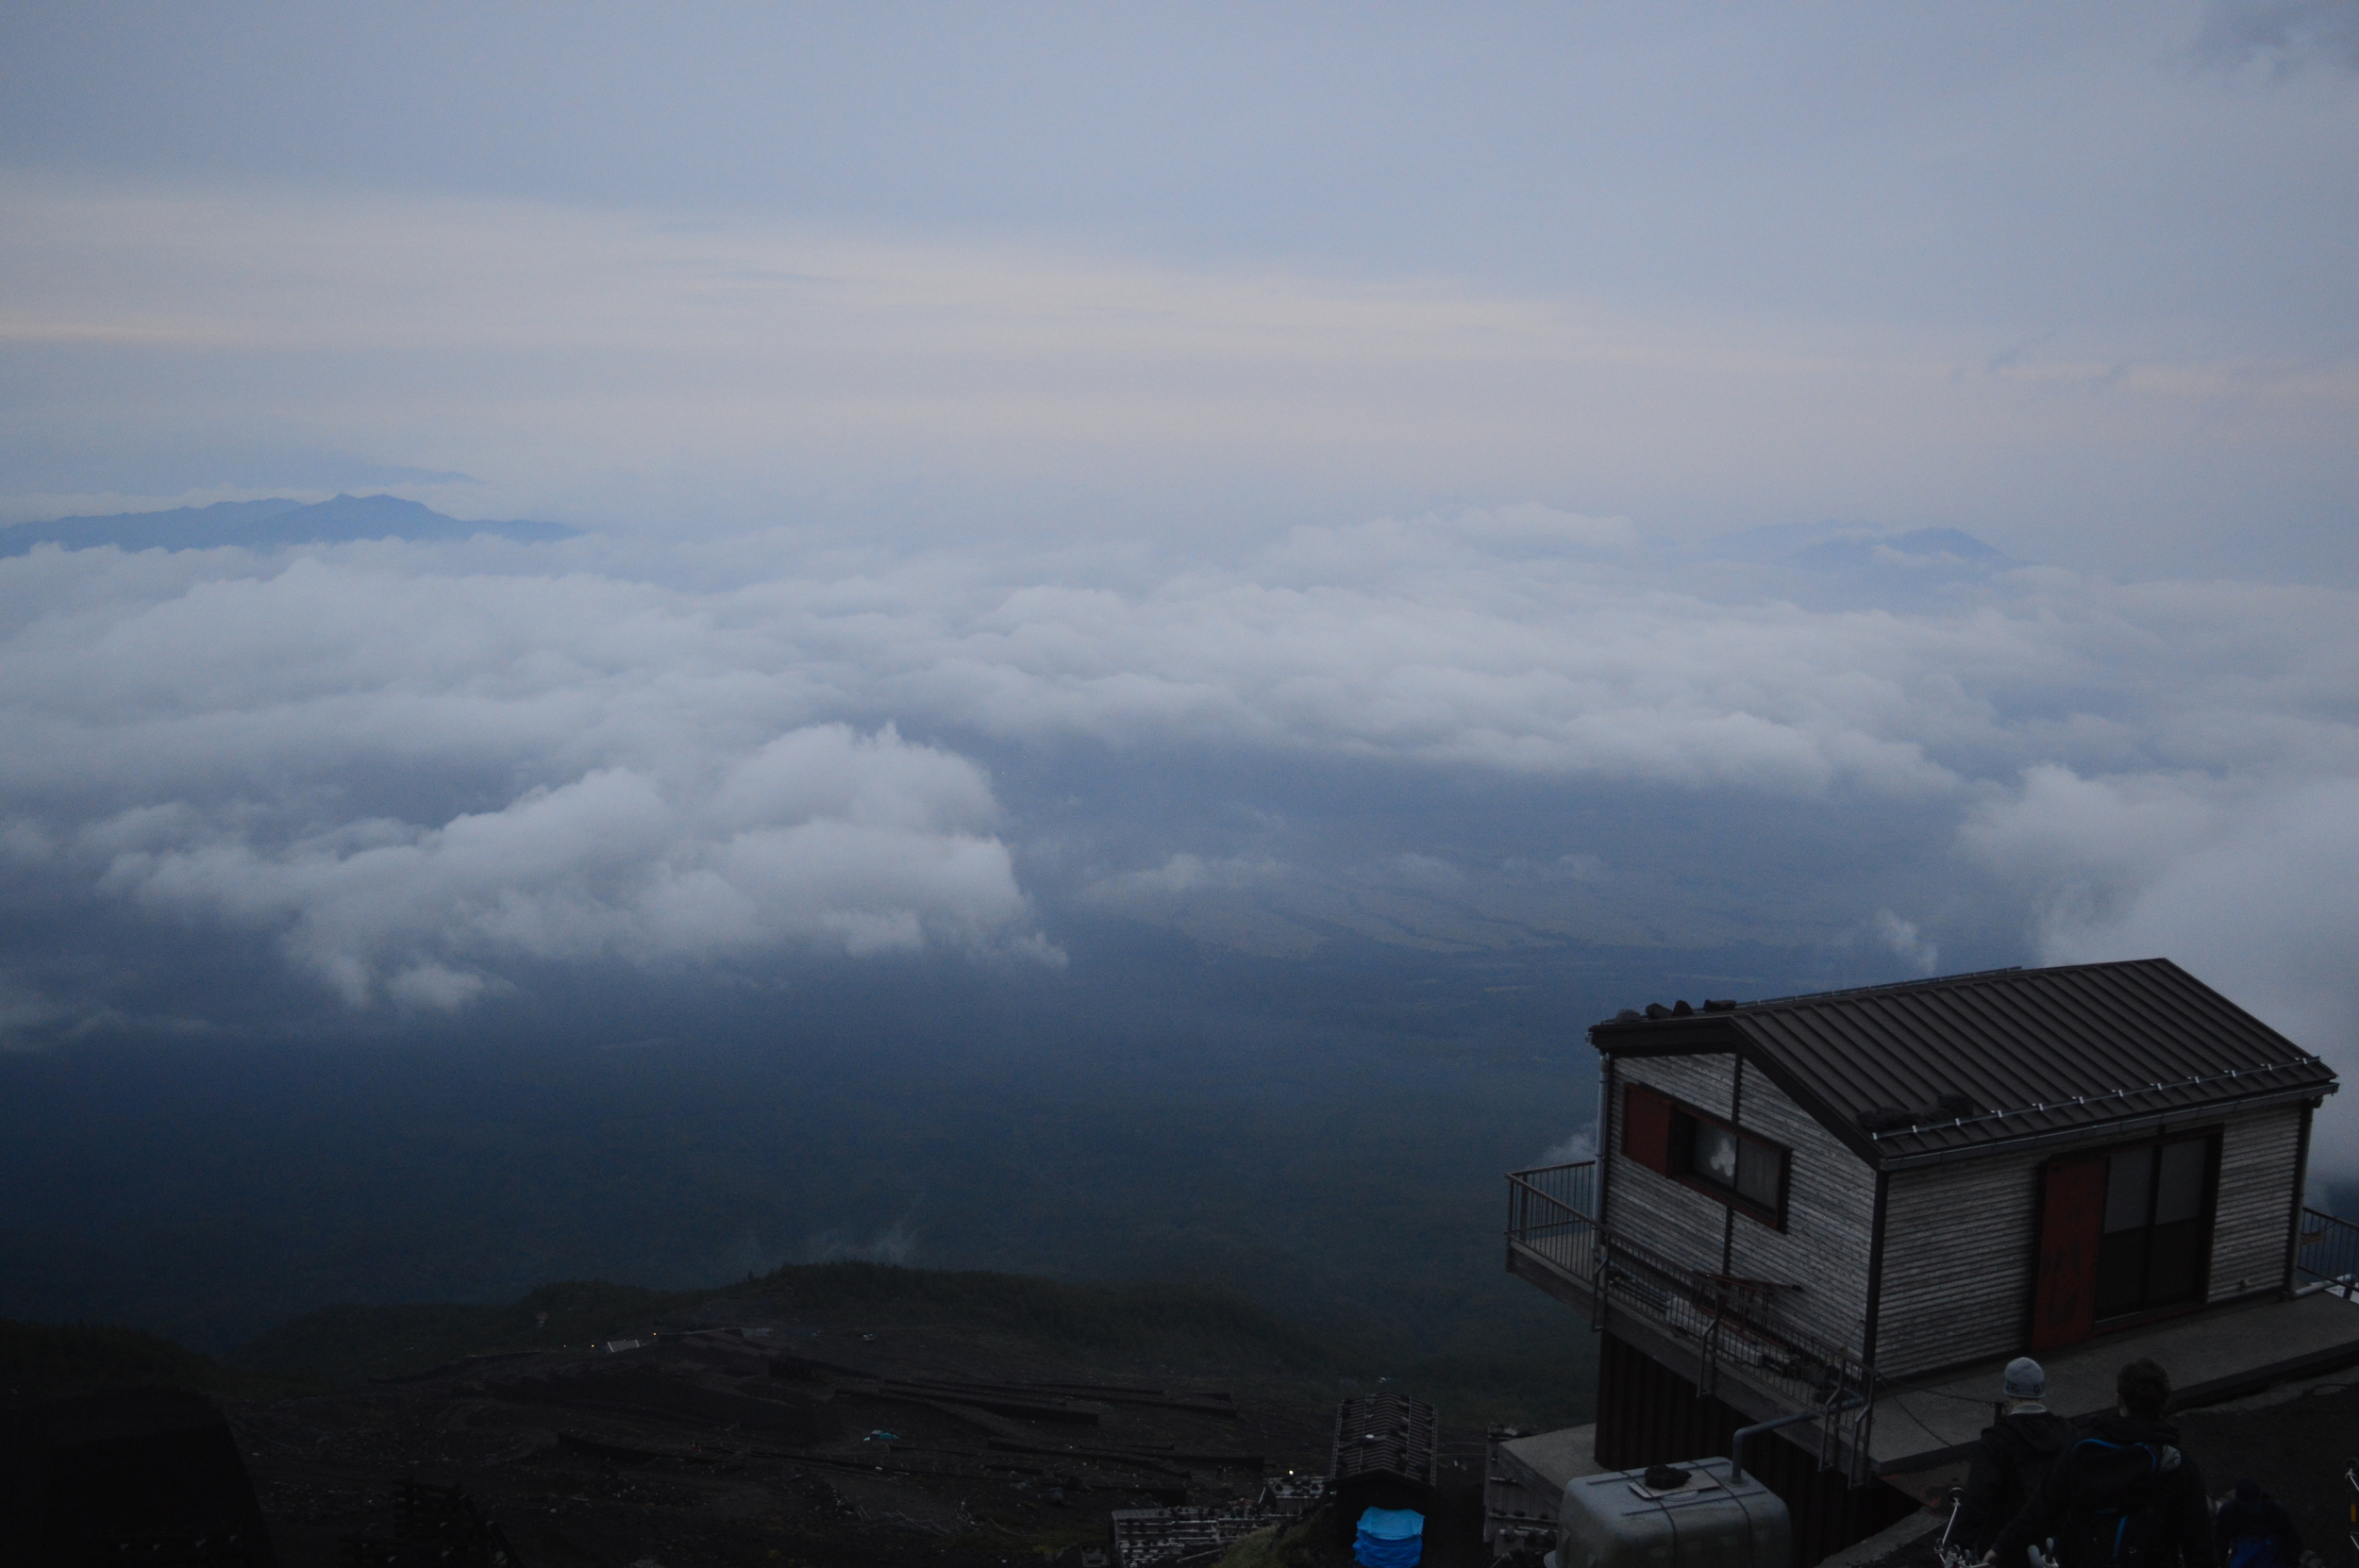 Climbing Mount Fuji. Bears on Mount Fuji.